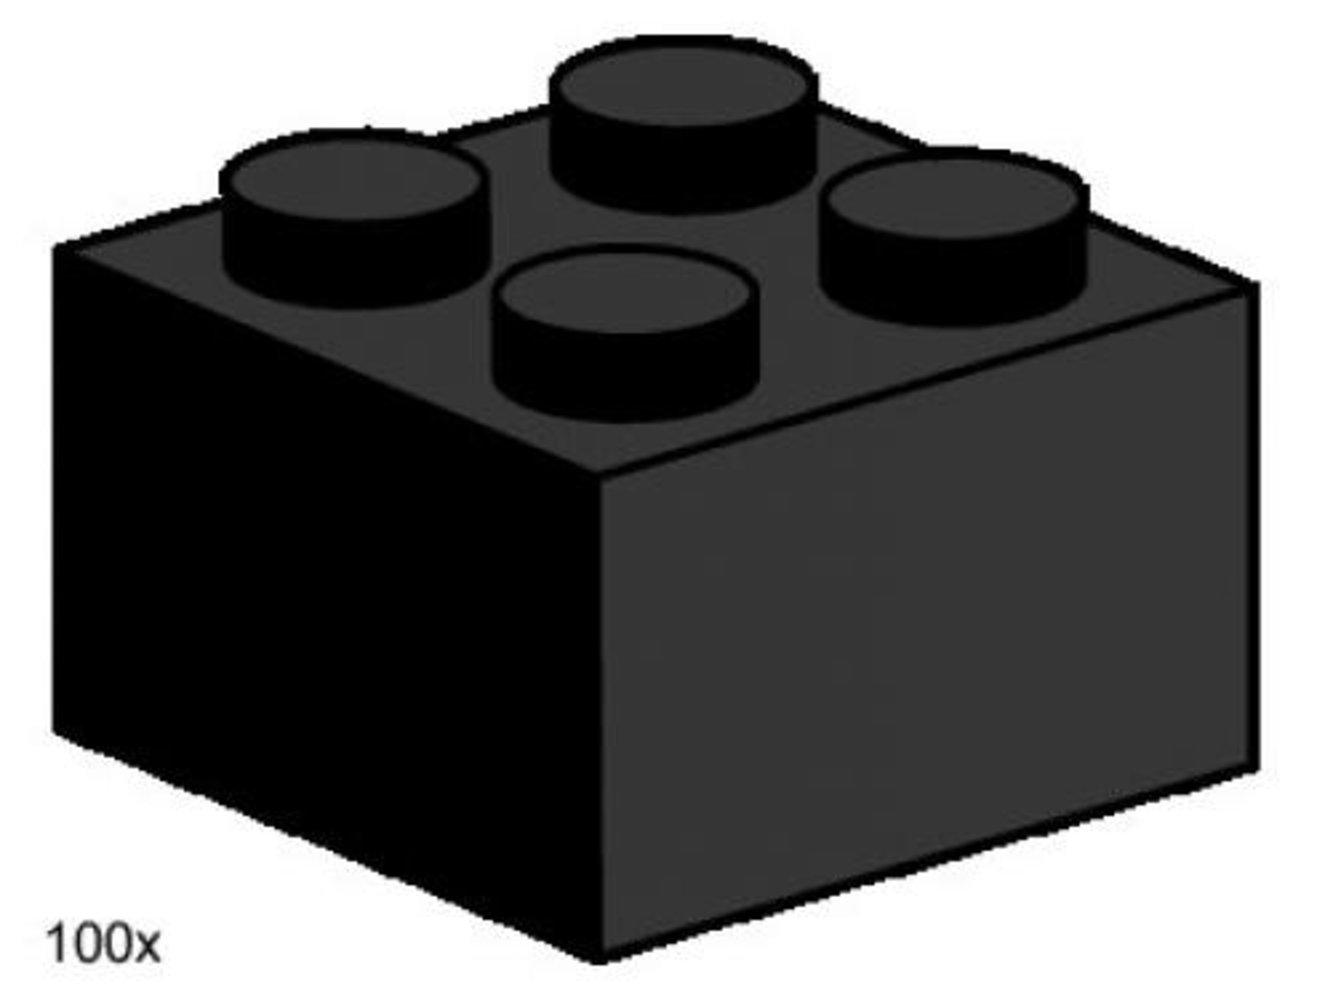 2 x 2 Black Bricks